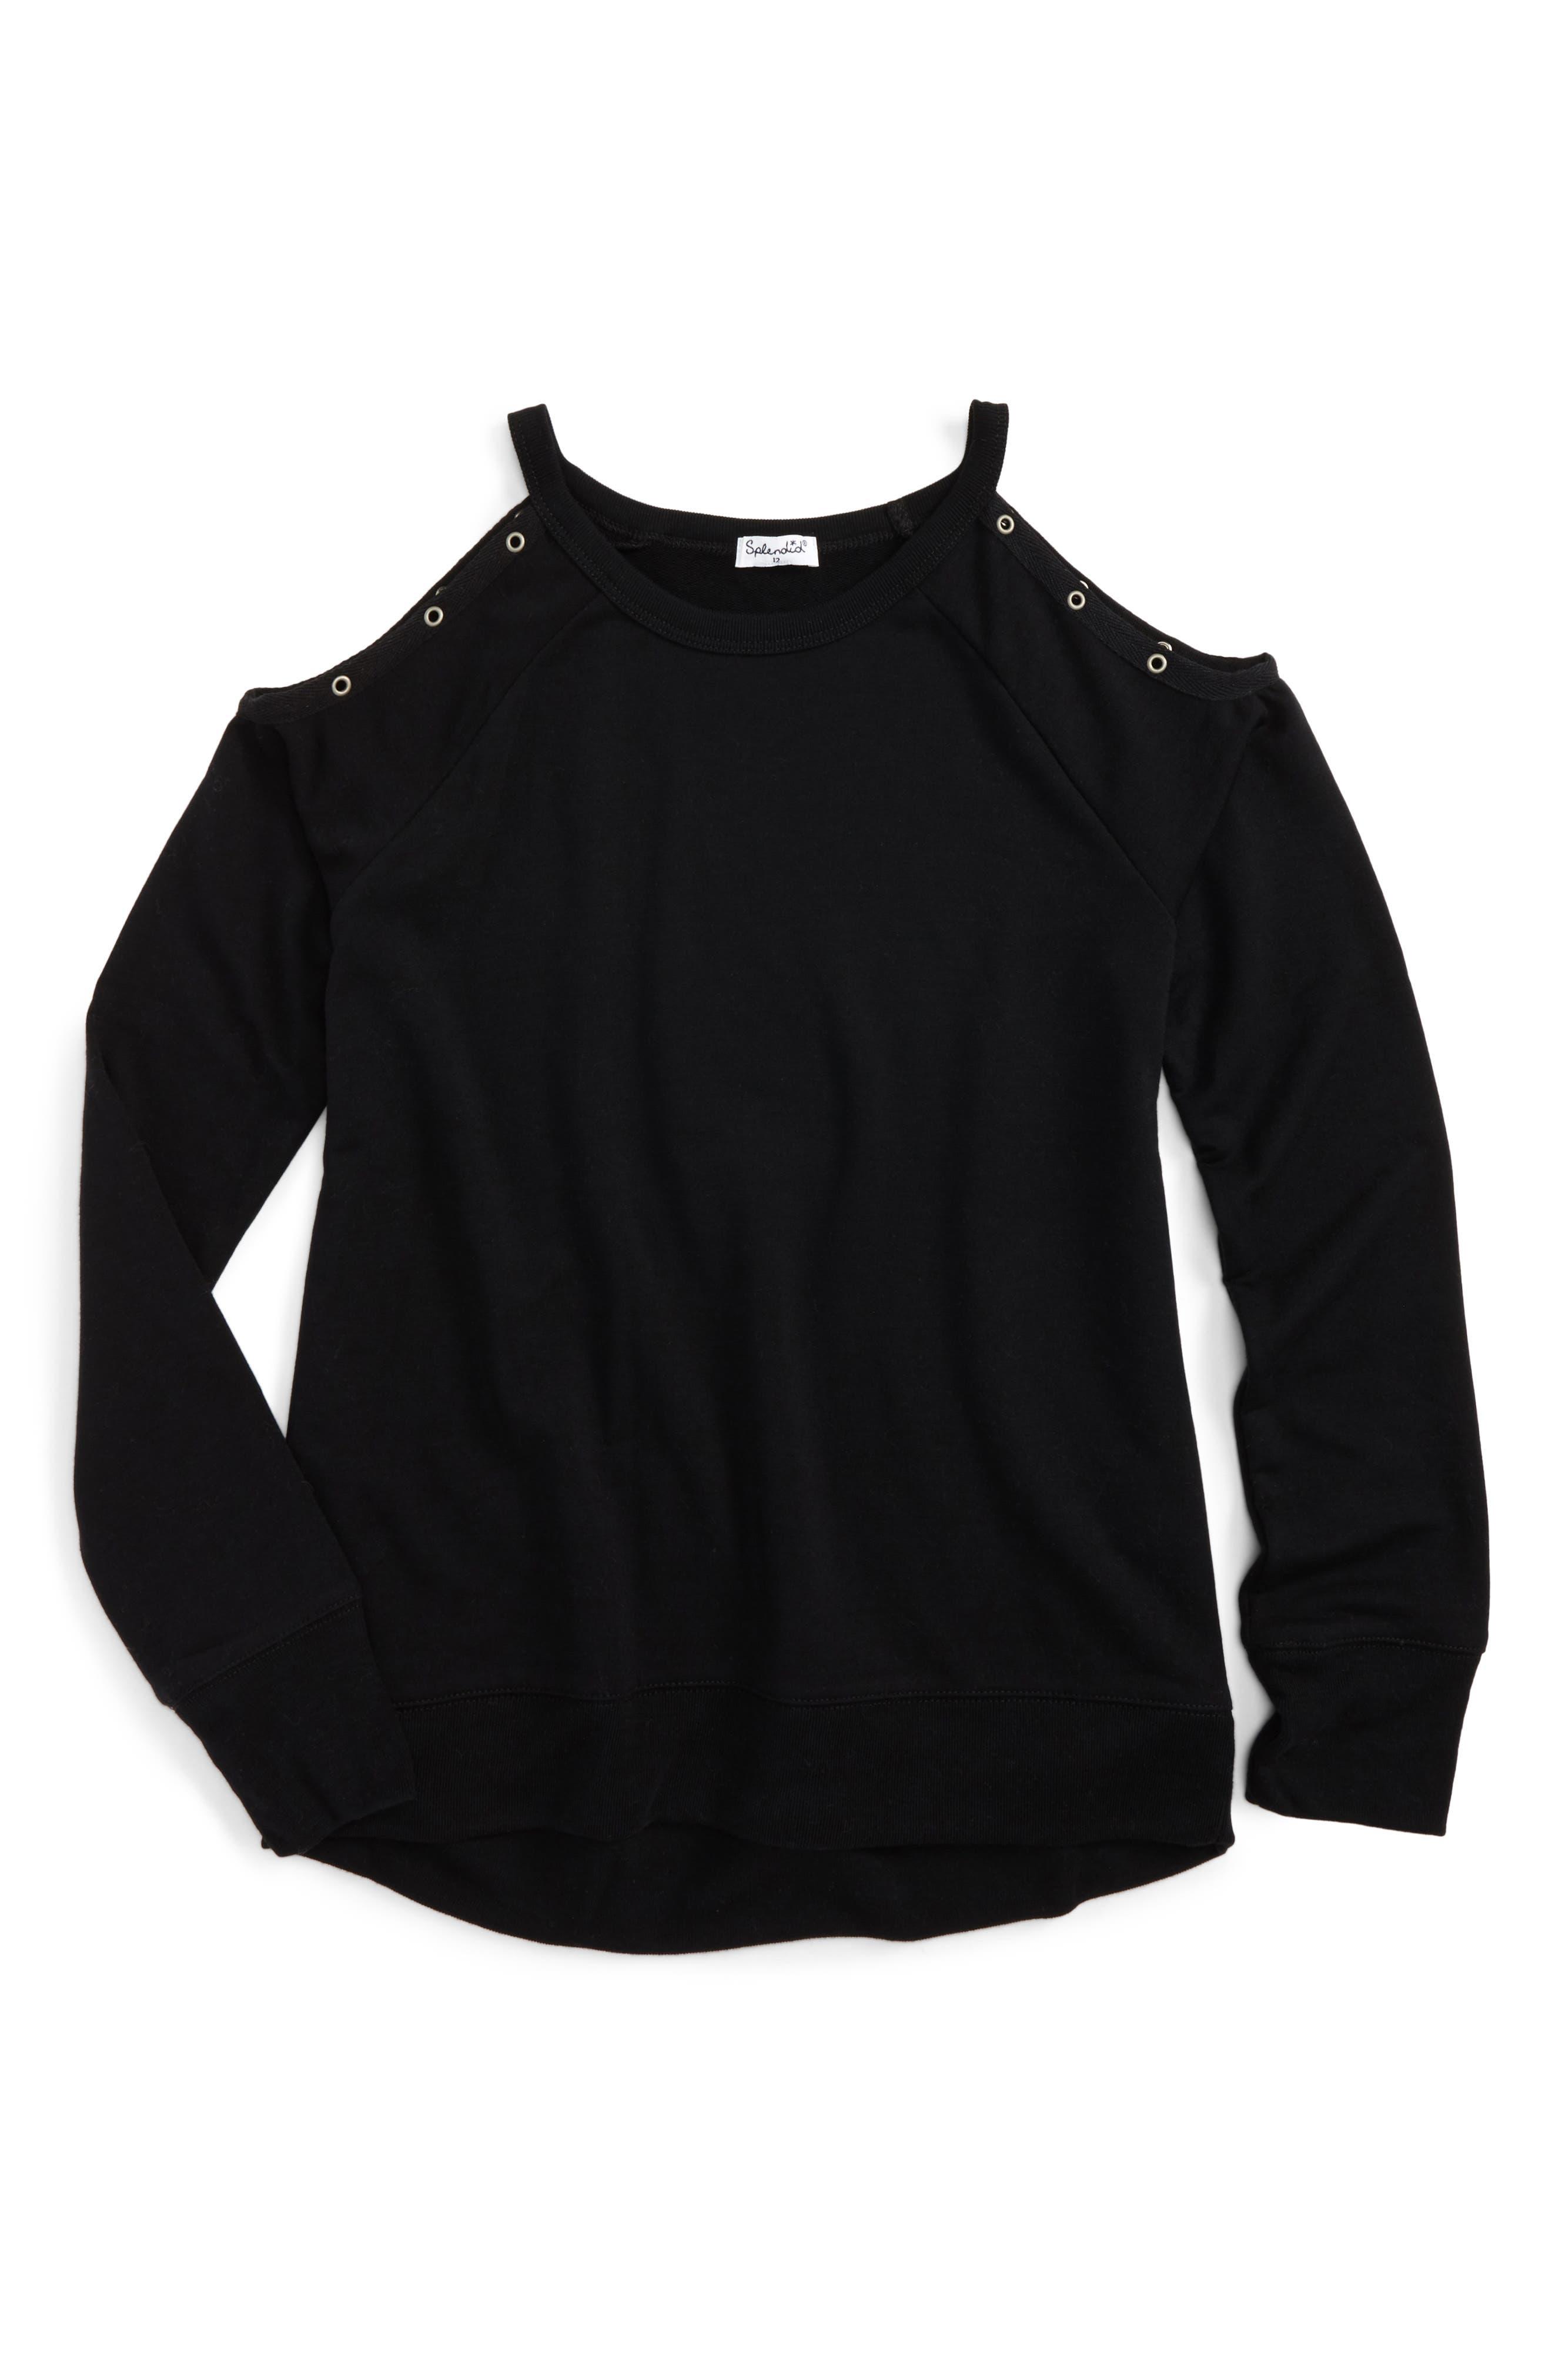 Splendid Cold Shoulder Sweatshirt (Big Girls)